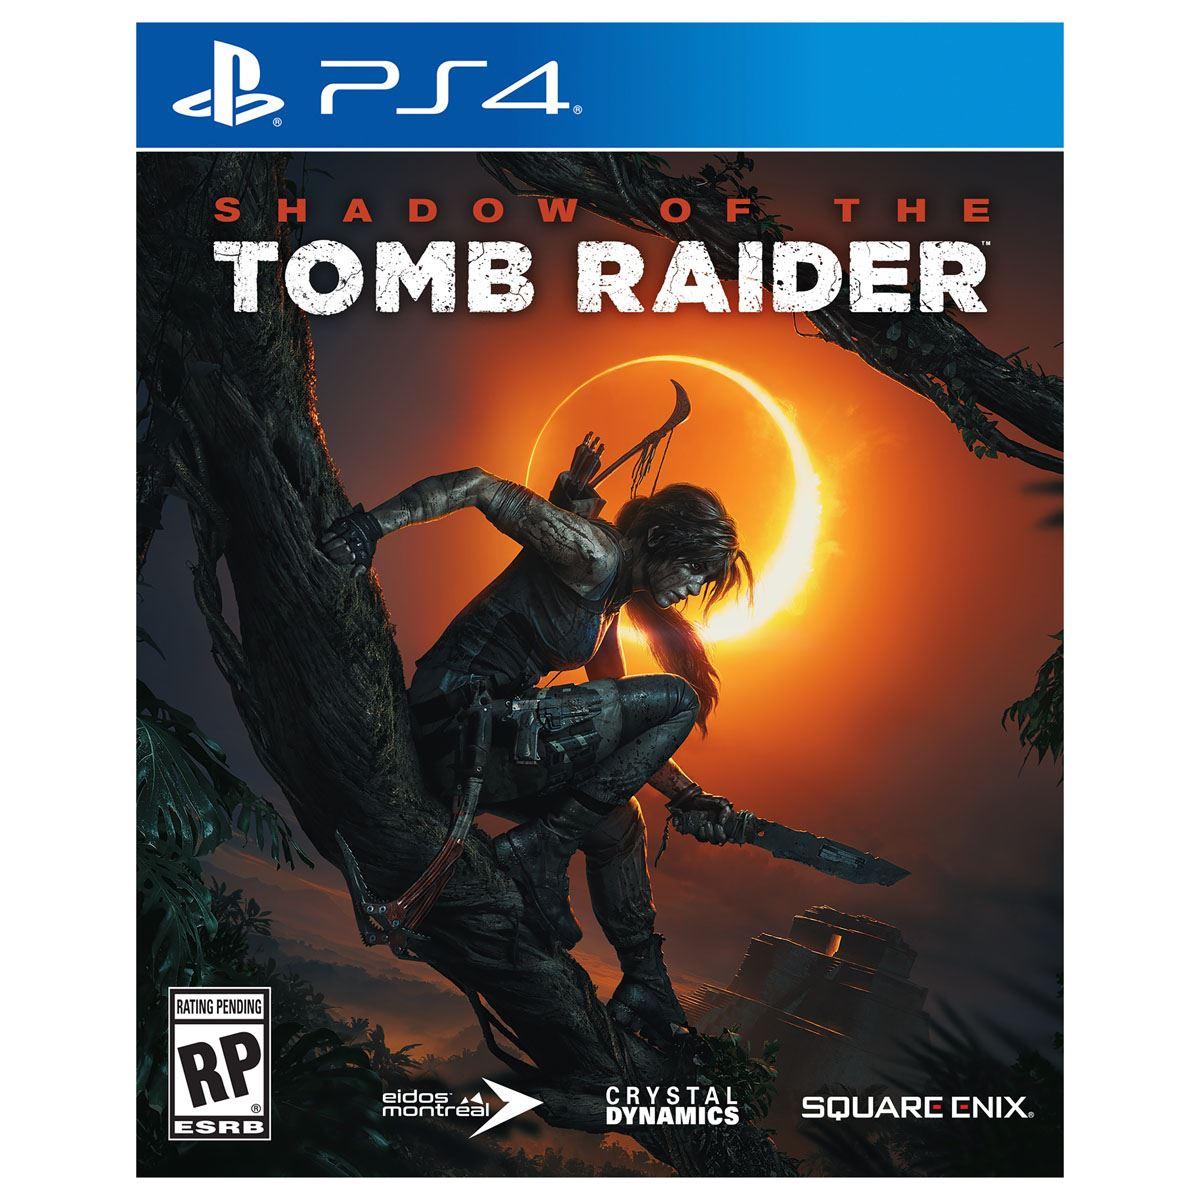 Sanborns: PS4 Shadow of the Tomb Raider